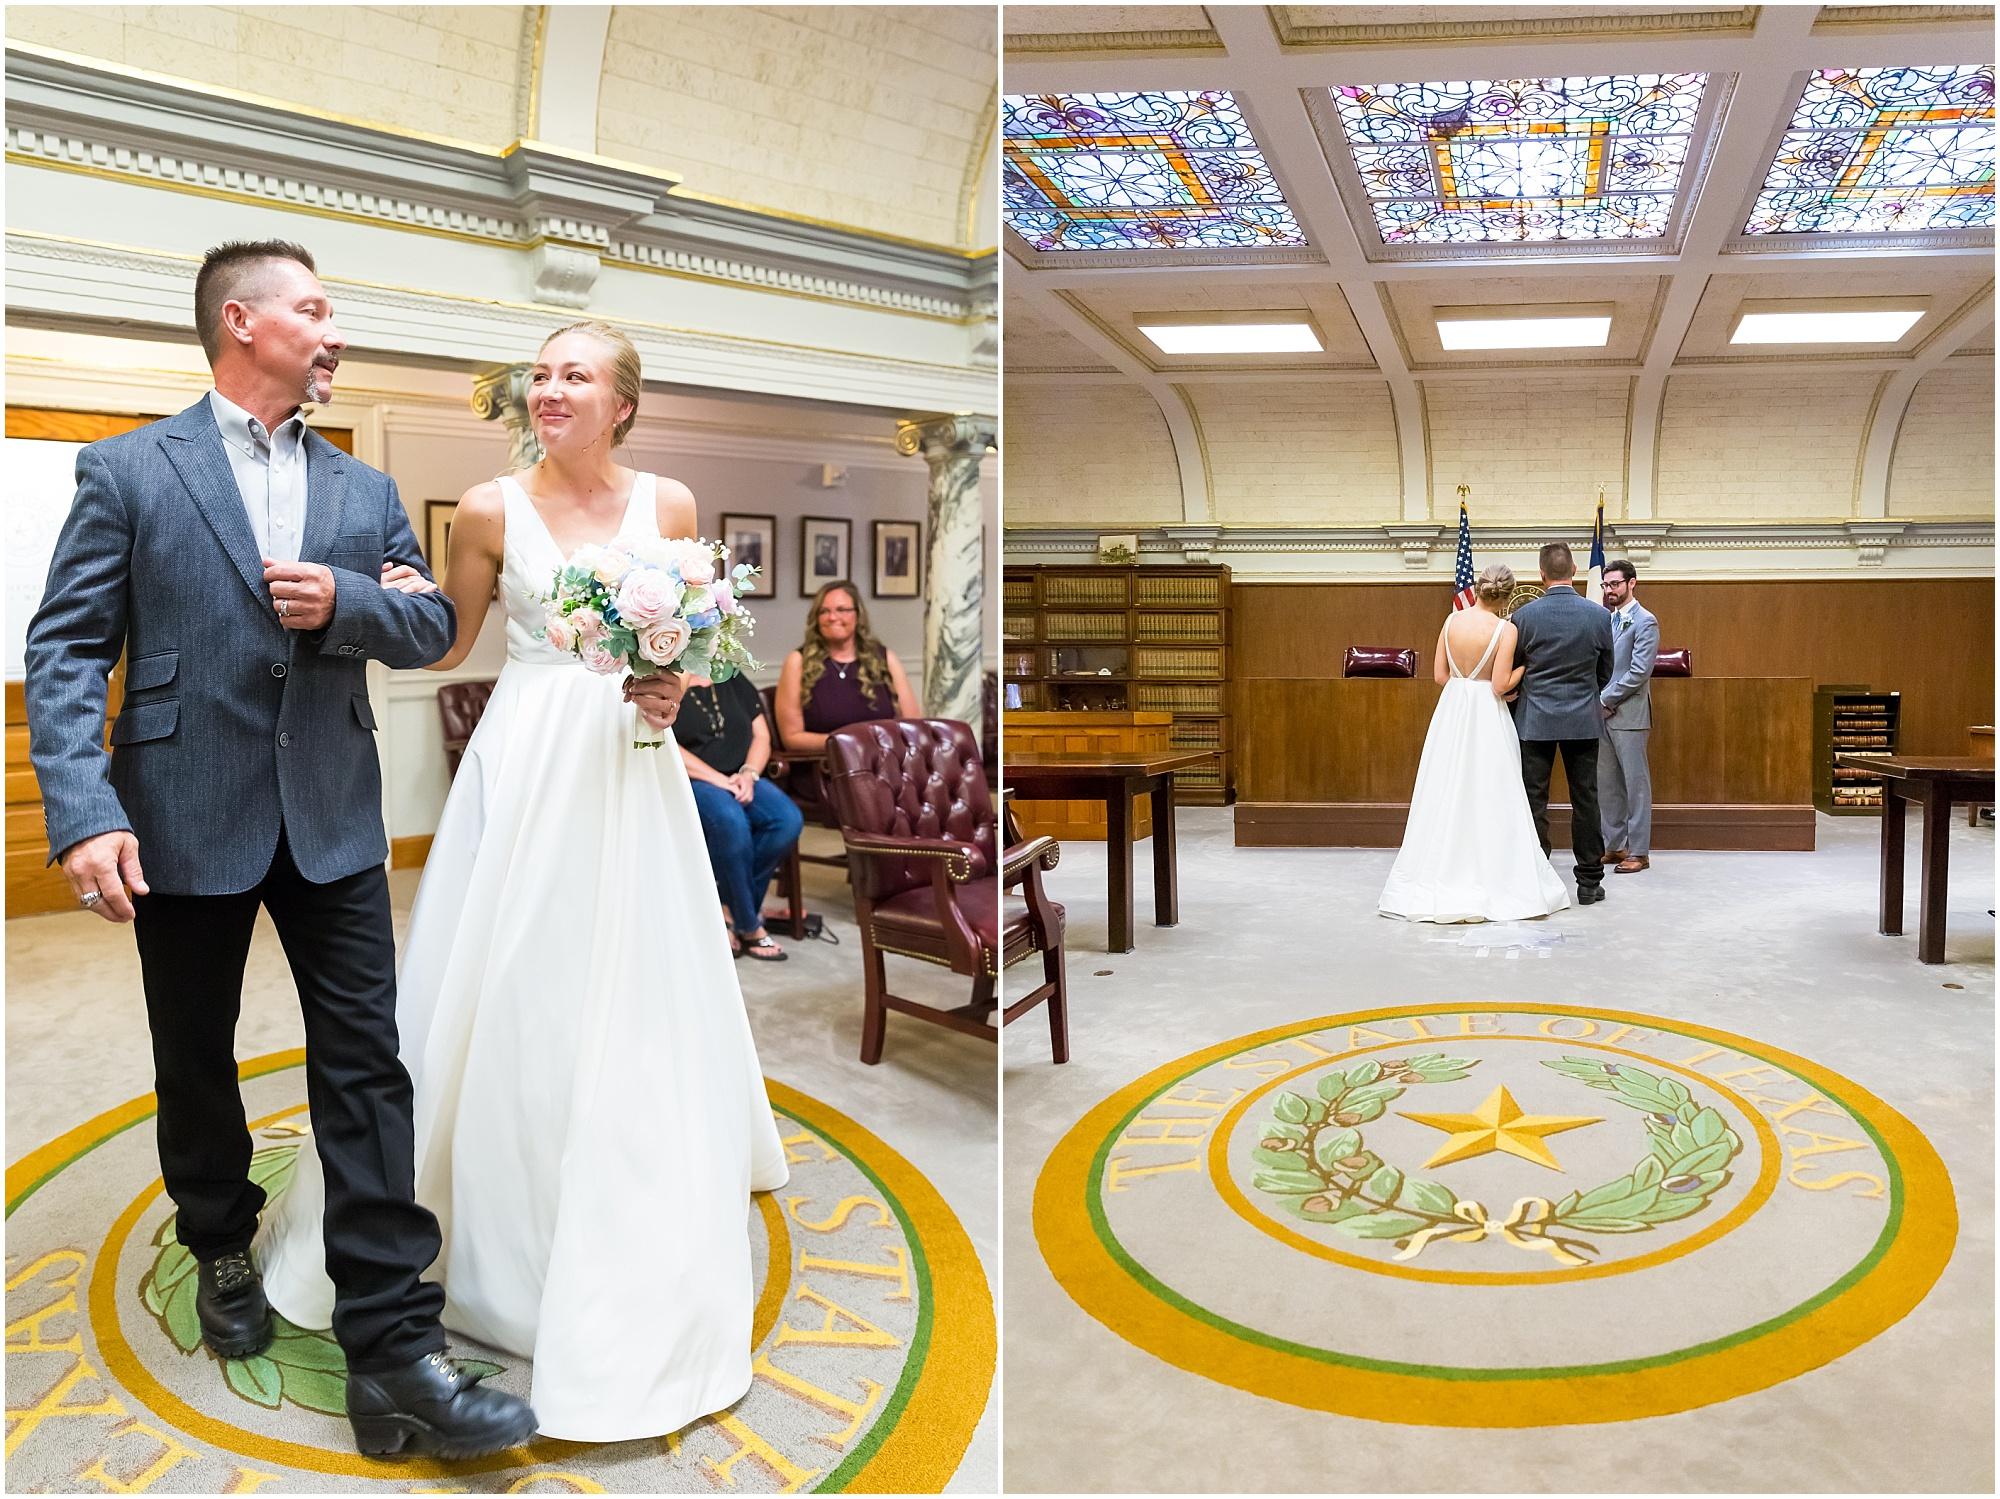 Courthouse-Wedding-Waco-Texas_0007.jpg